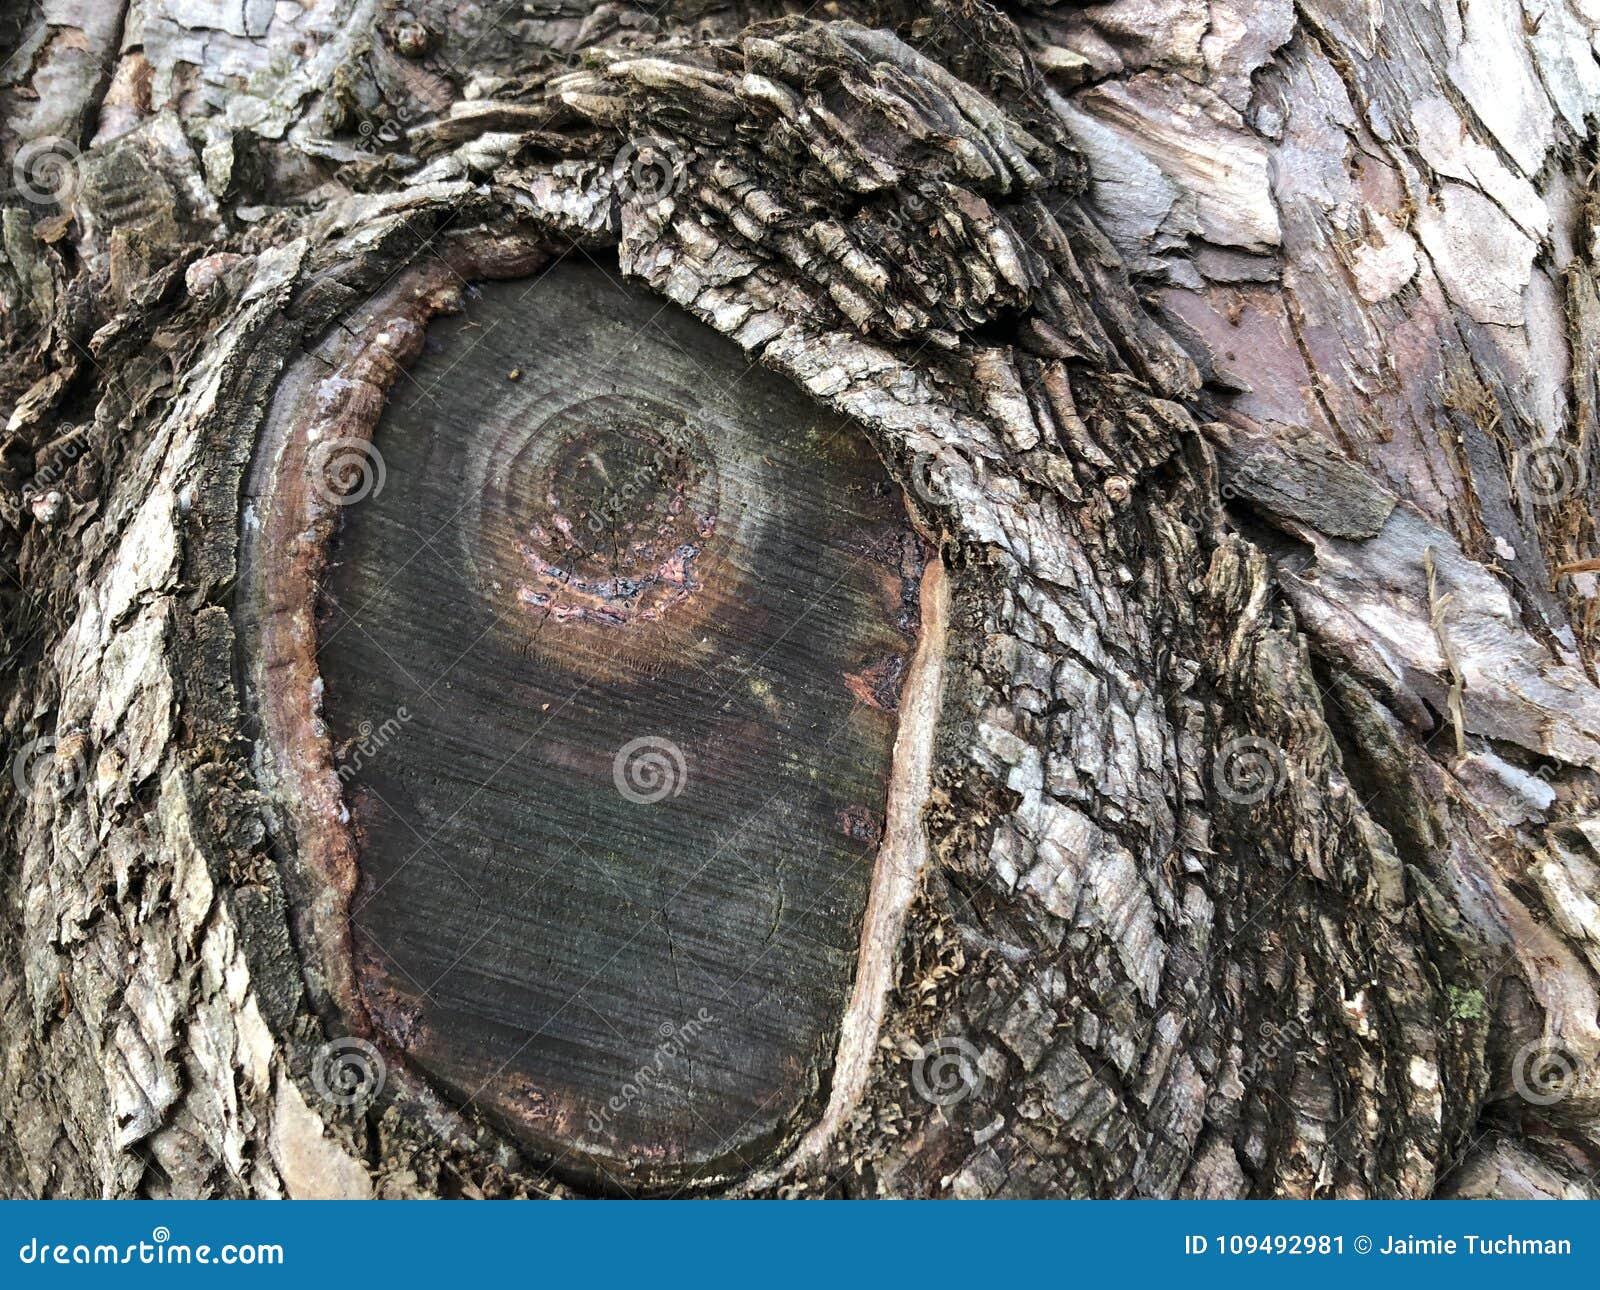 Textured Bark Of A Dawn Redwood Tree Stock Image Image Of Fiber